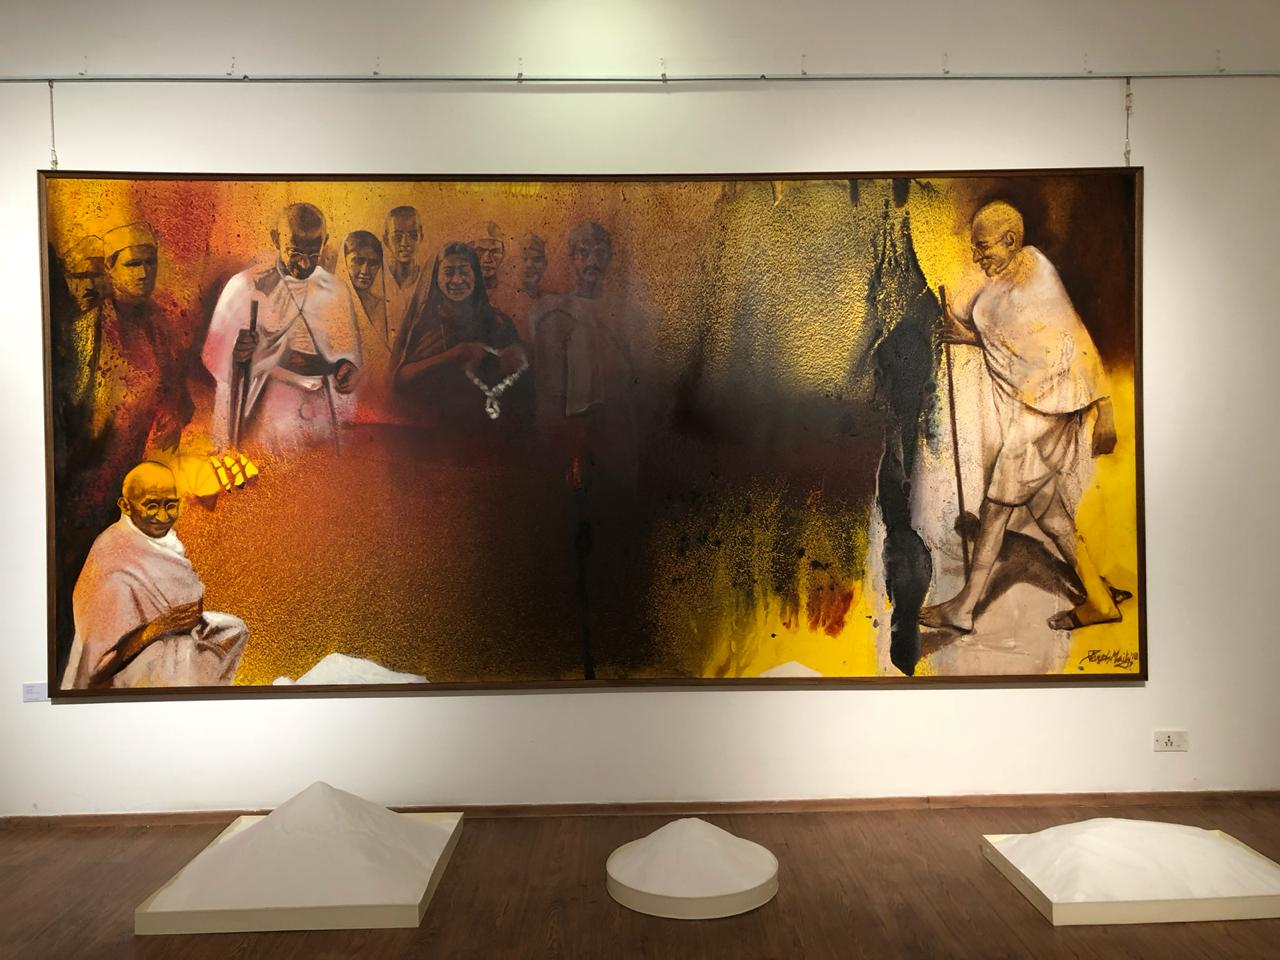 Paresh Maity, painter of longest work, pays tribute to tallest leader Gandhi